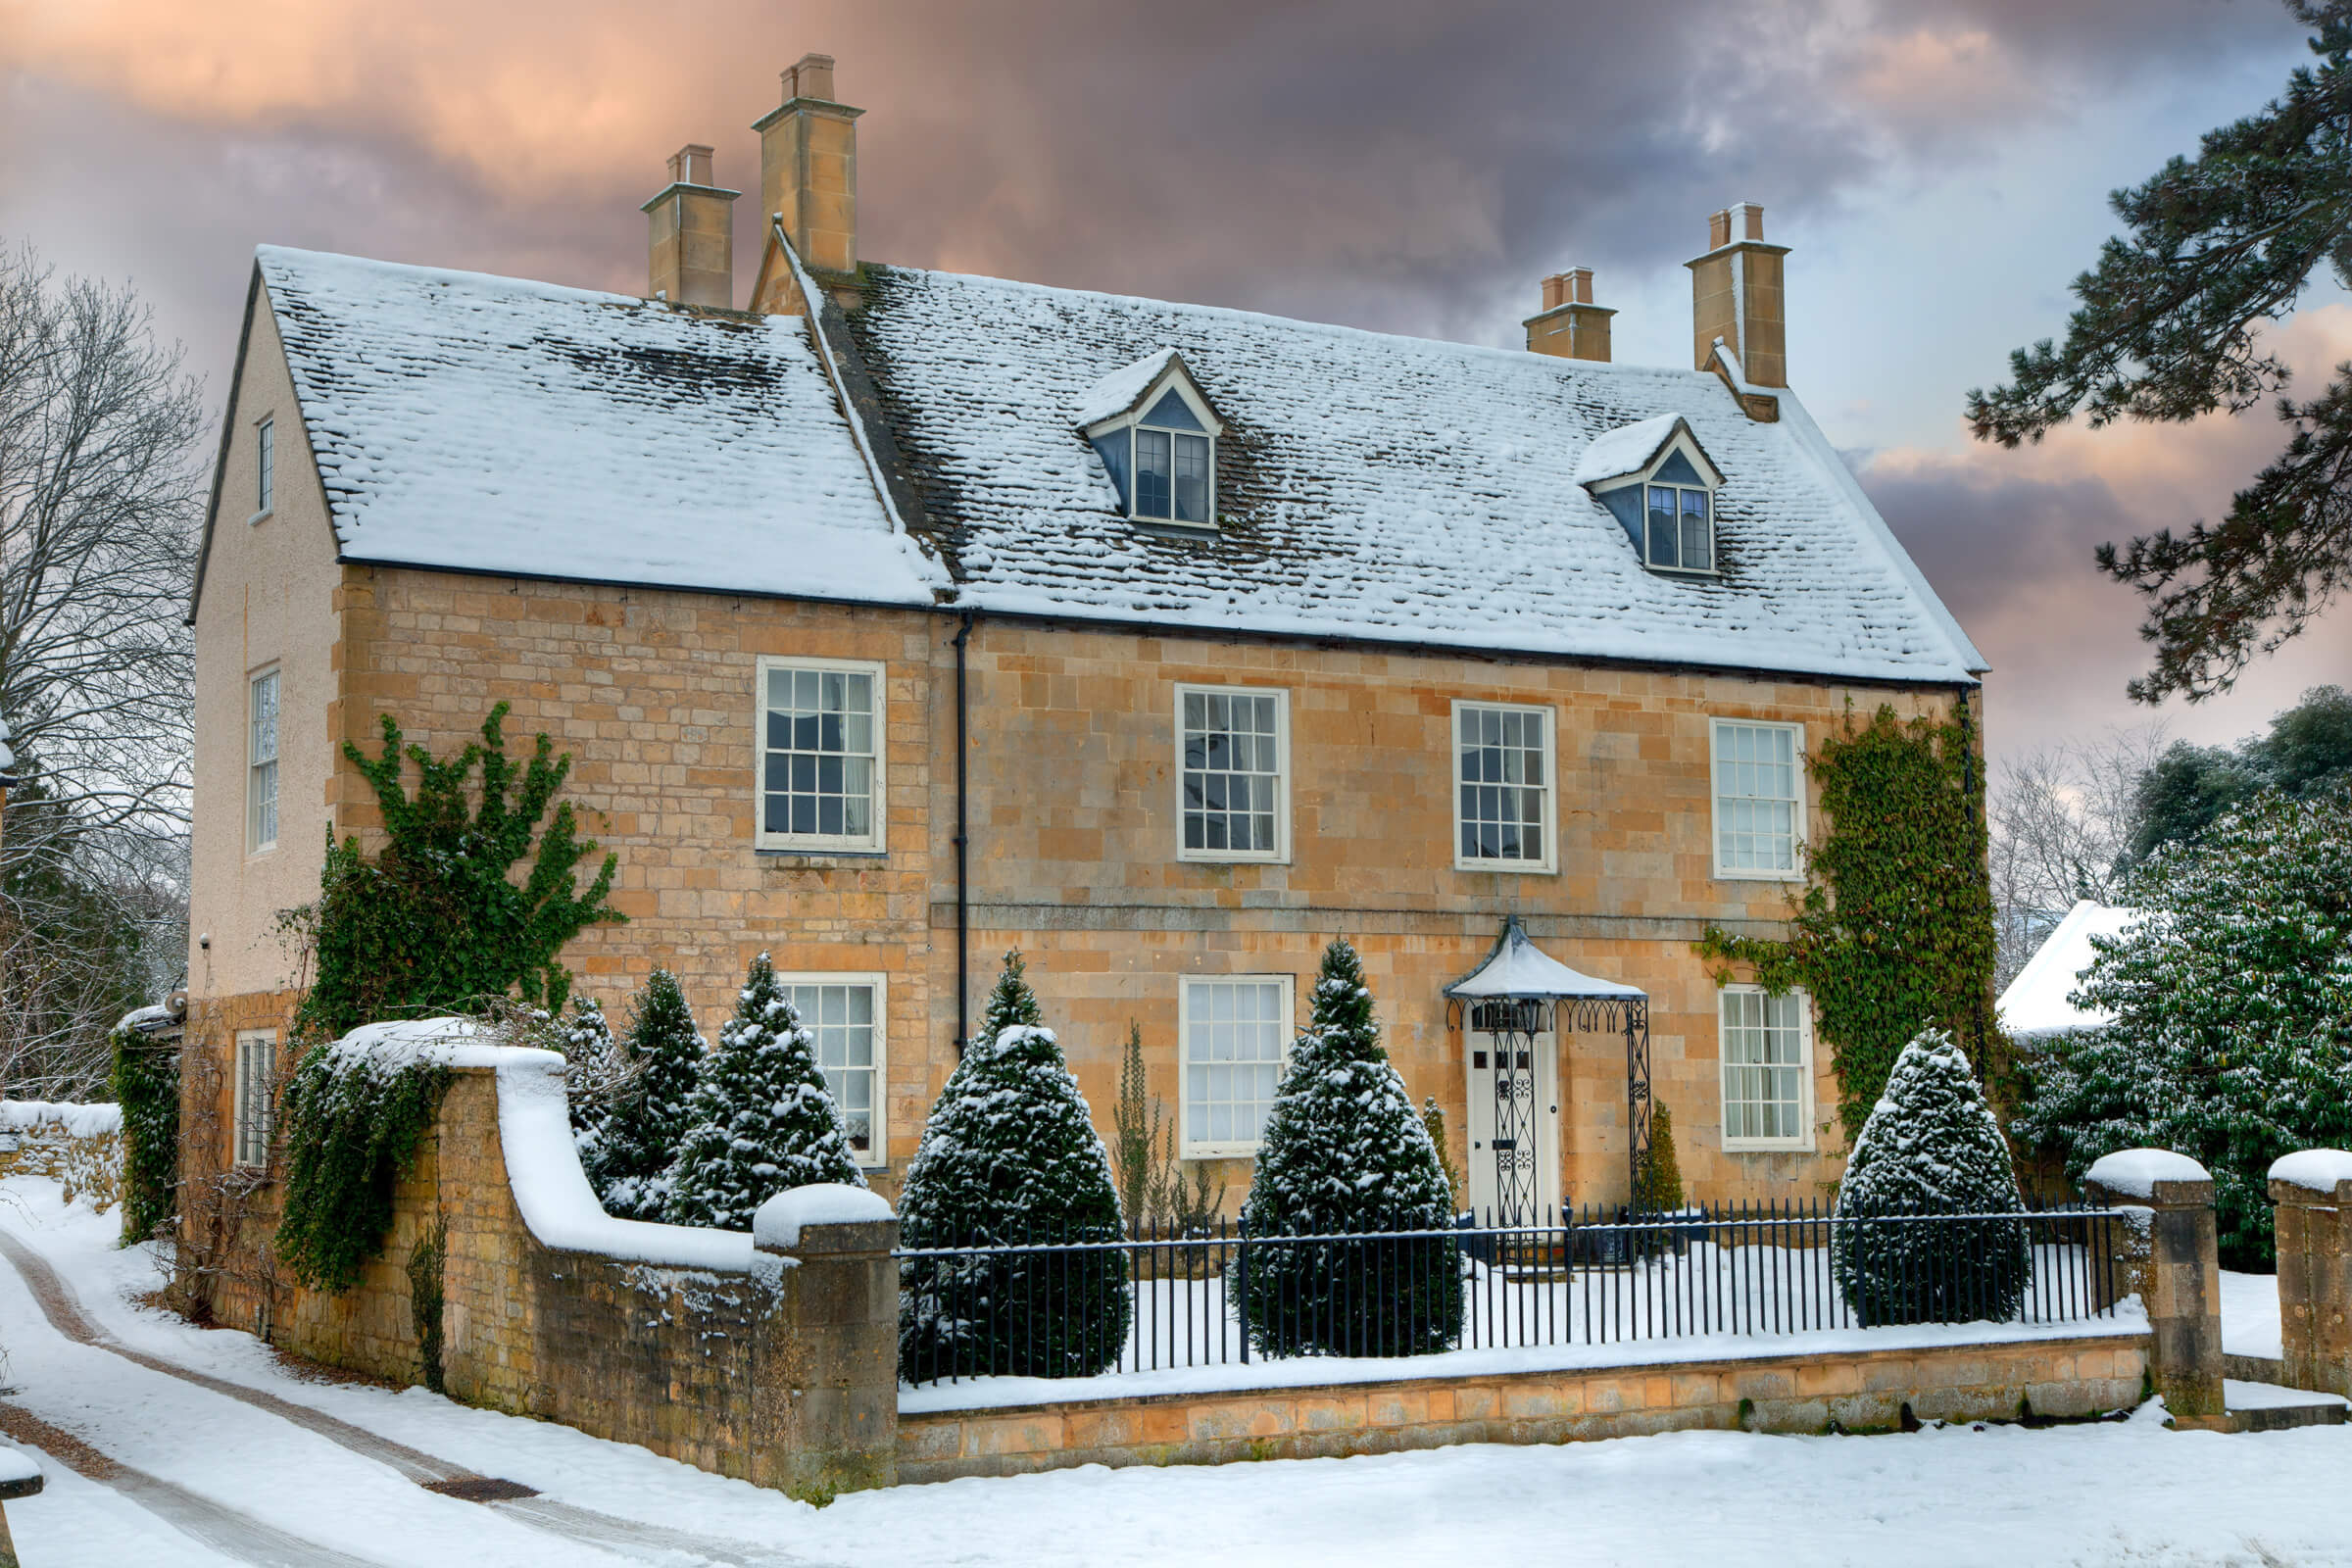 Conservation casement windows on a snowy cottage